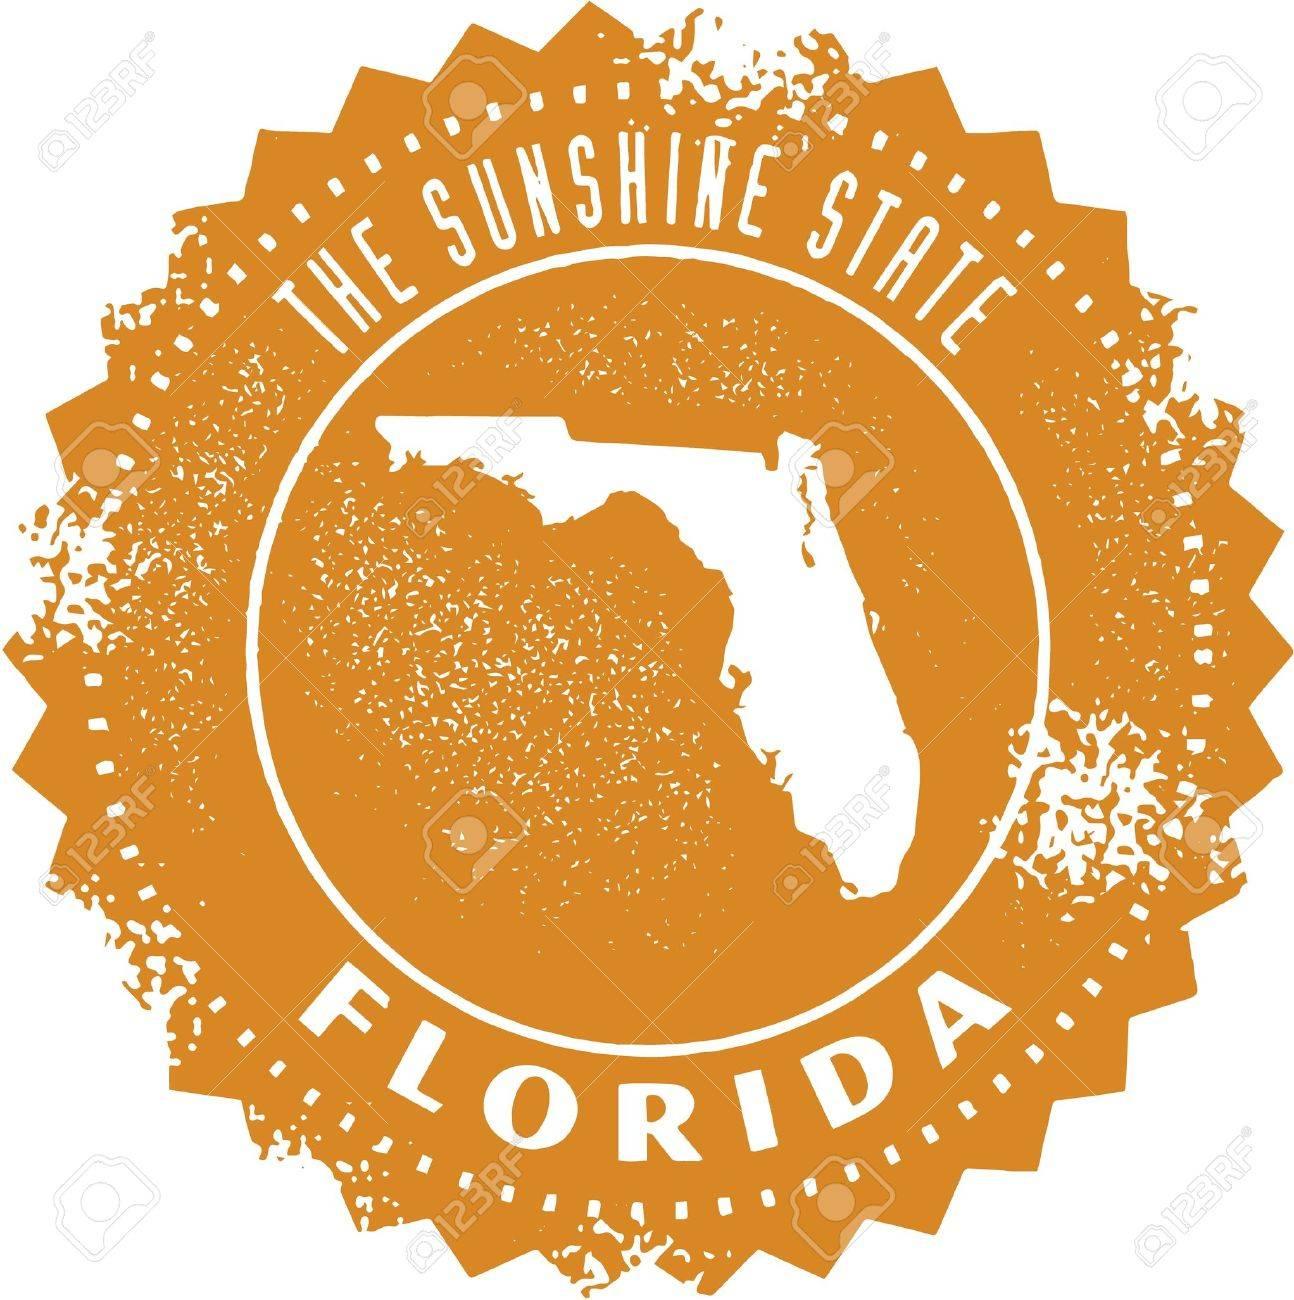 Vintage Florida USA State Stamp Royalty Free Cliparts Vectors - Orlando florida on us map